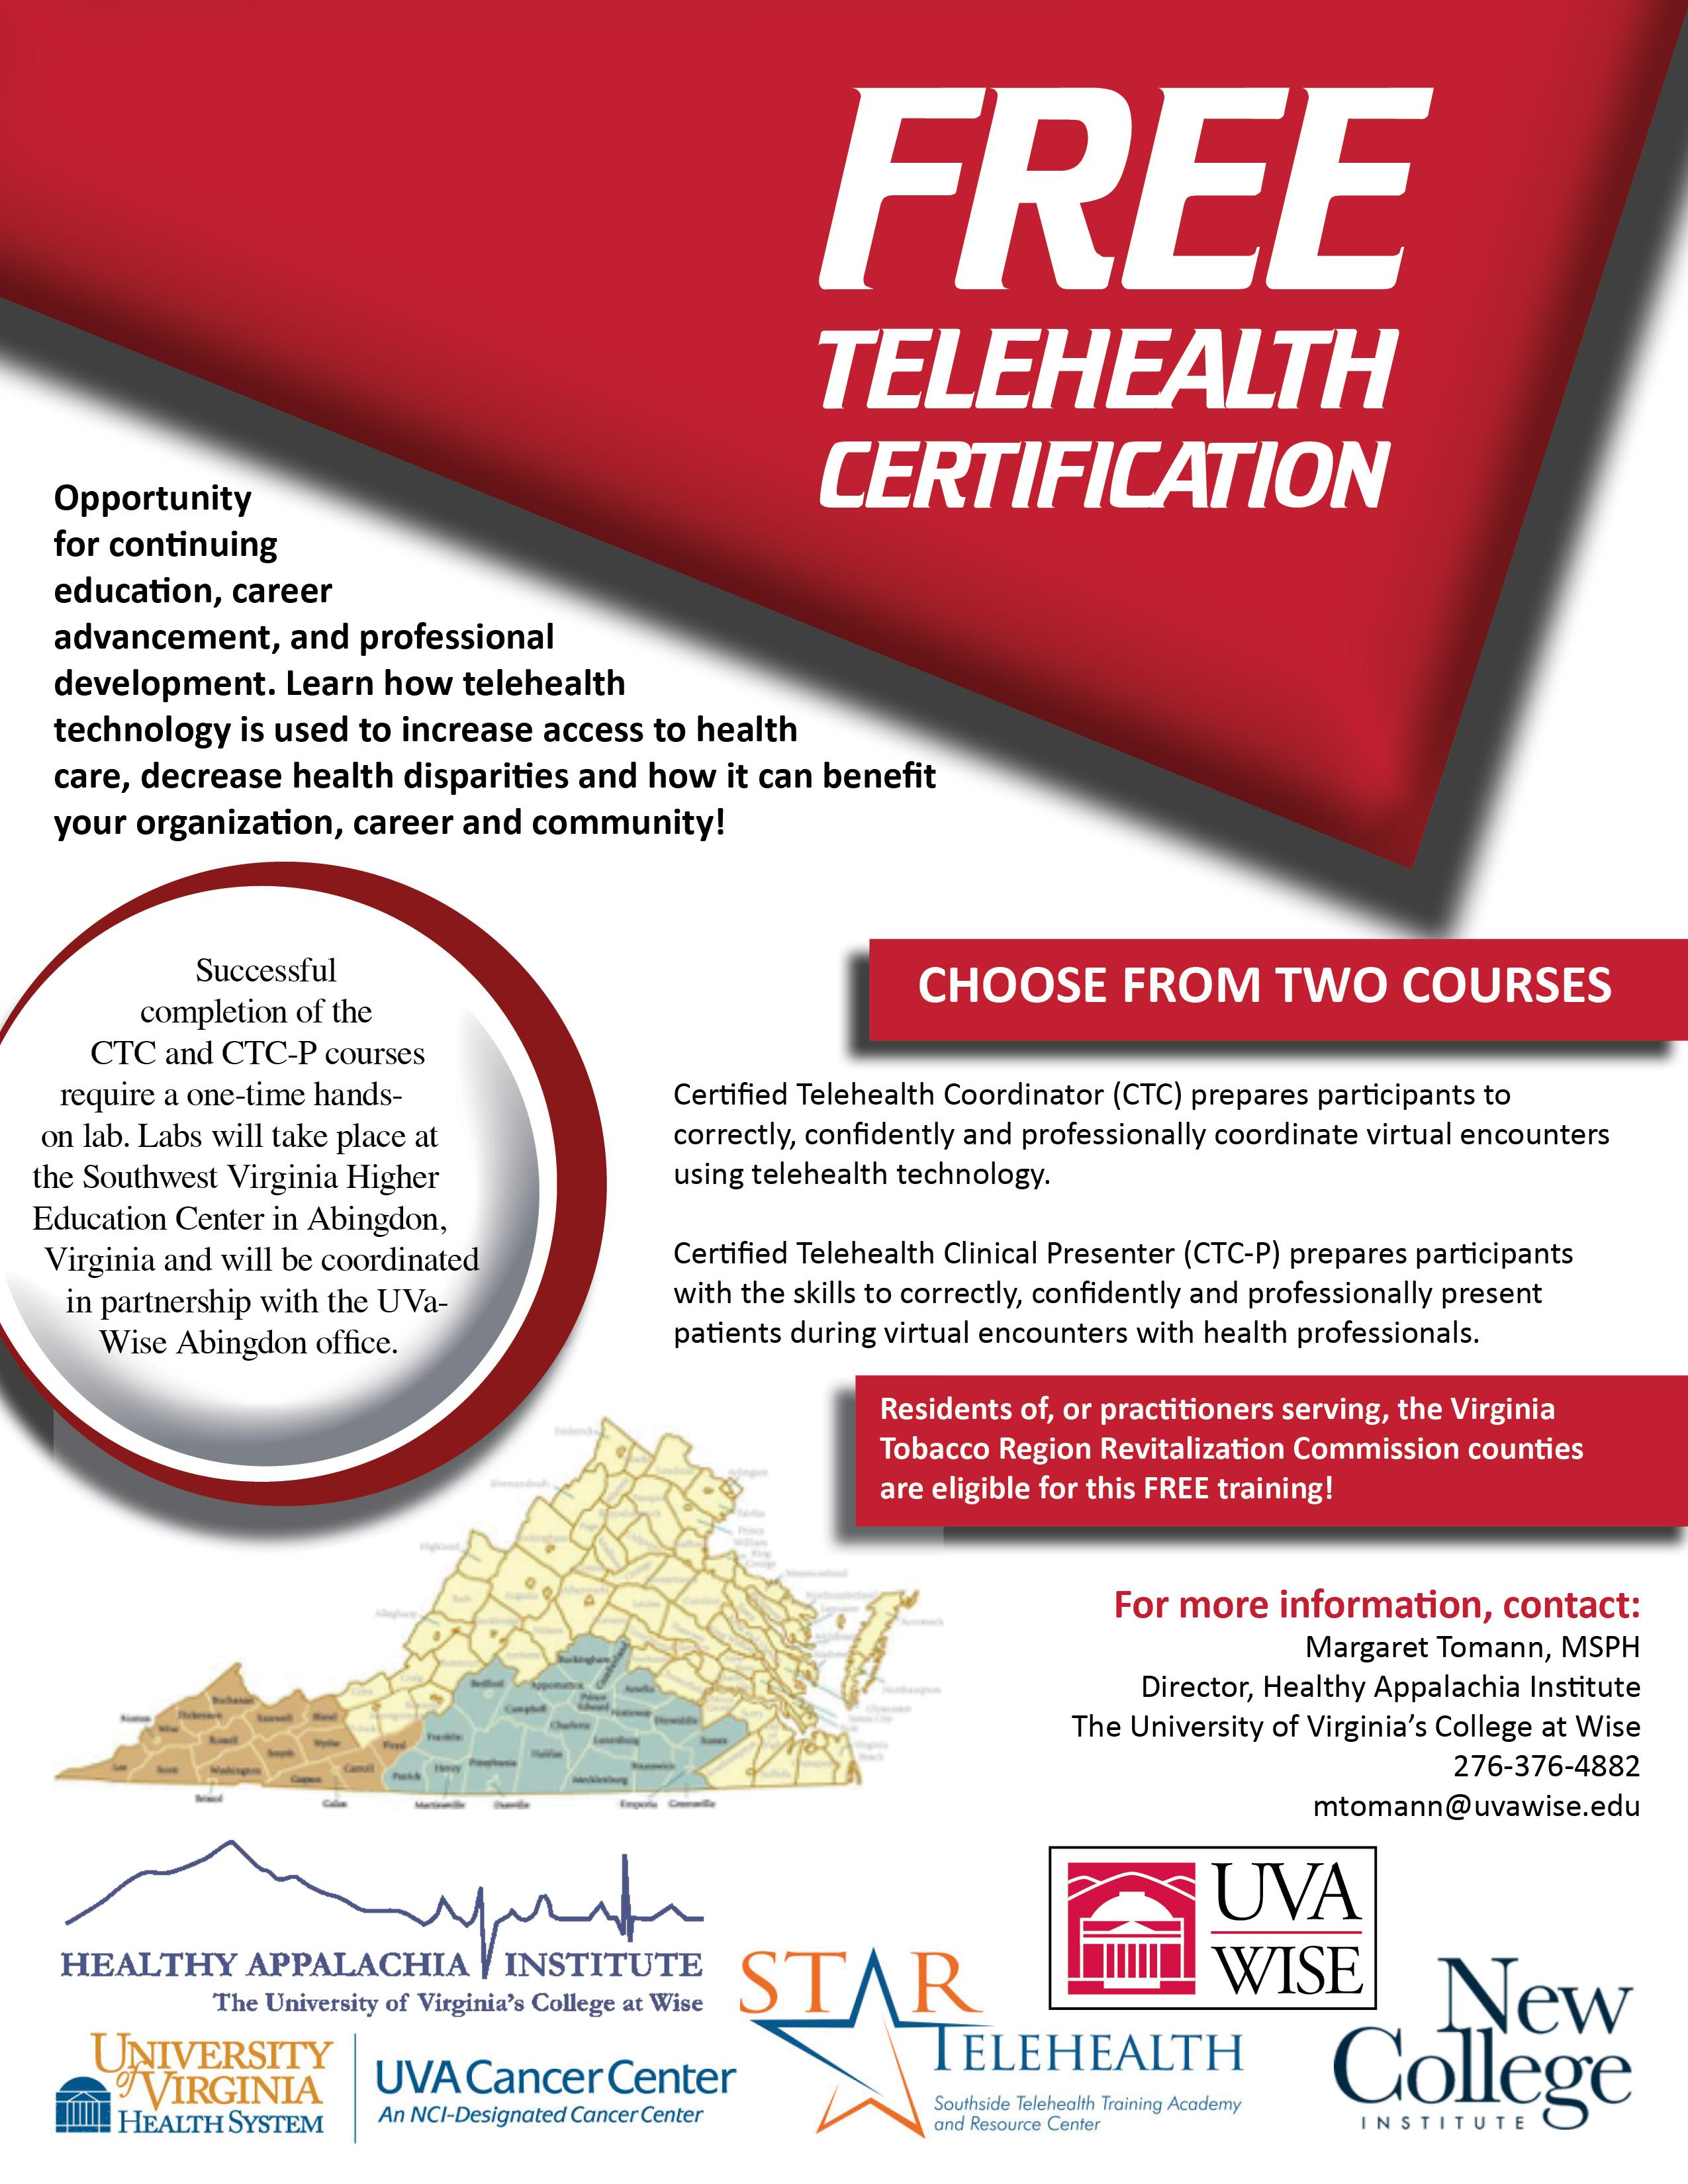 Telehealth certification southwest virginia graduate medical telehealth certification southwest virginia graduate medical education 1betcityfo Choice Image